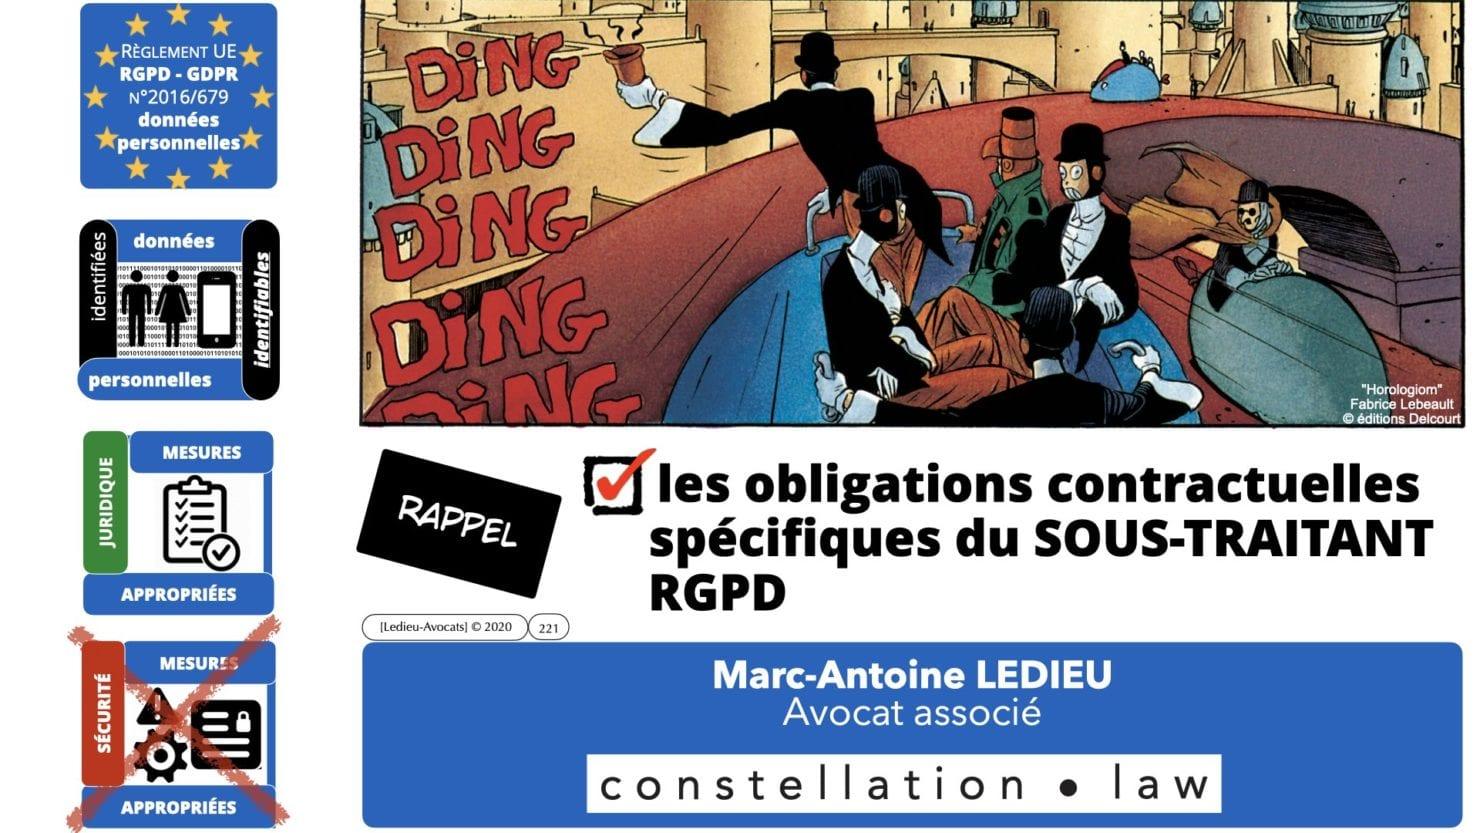 RGPD e-Privacy principes actualité jurisprudence ©Ledieu-Avocats 25-06-2021.221